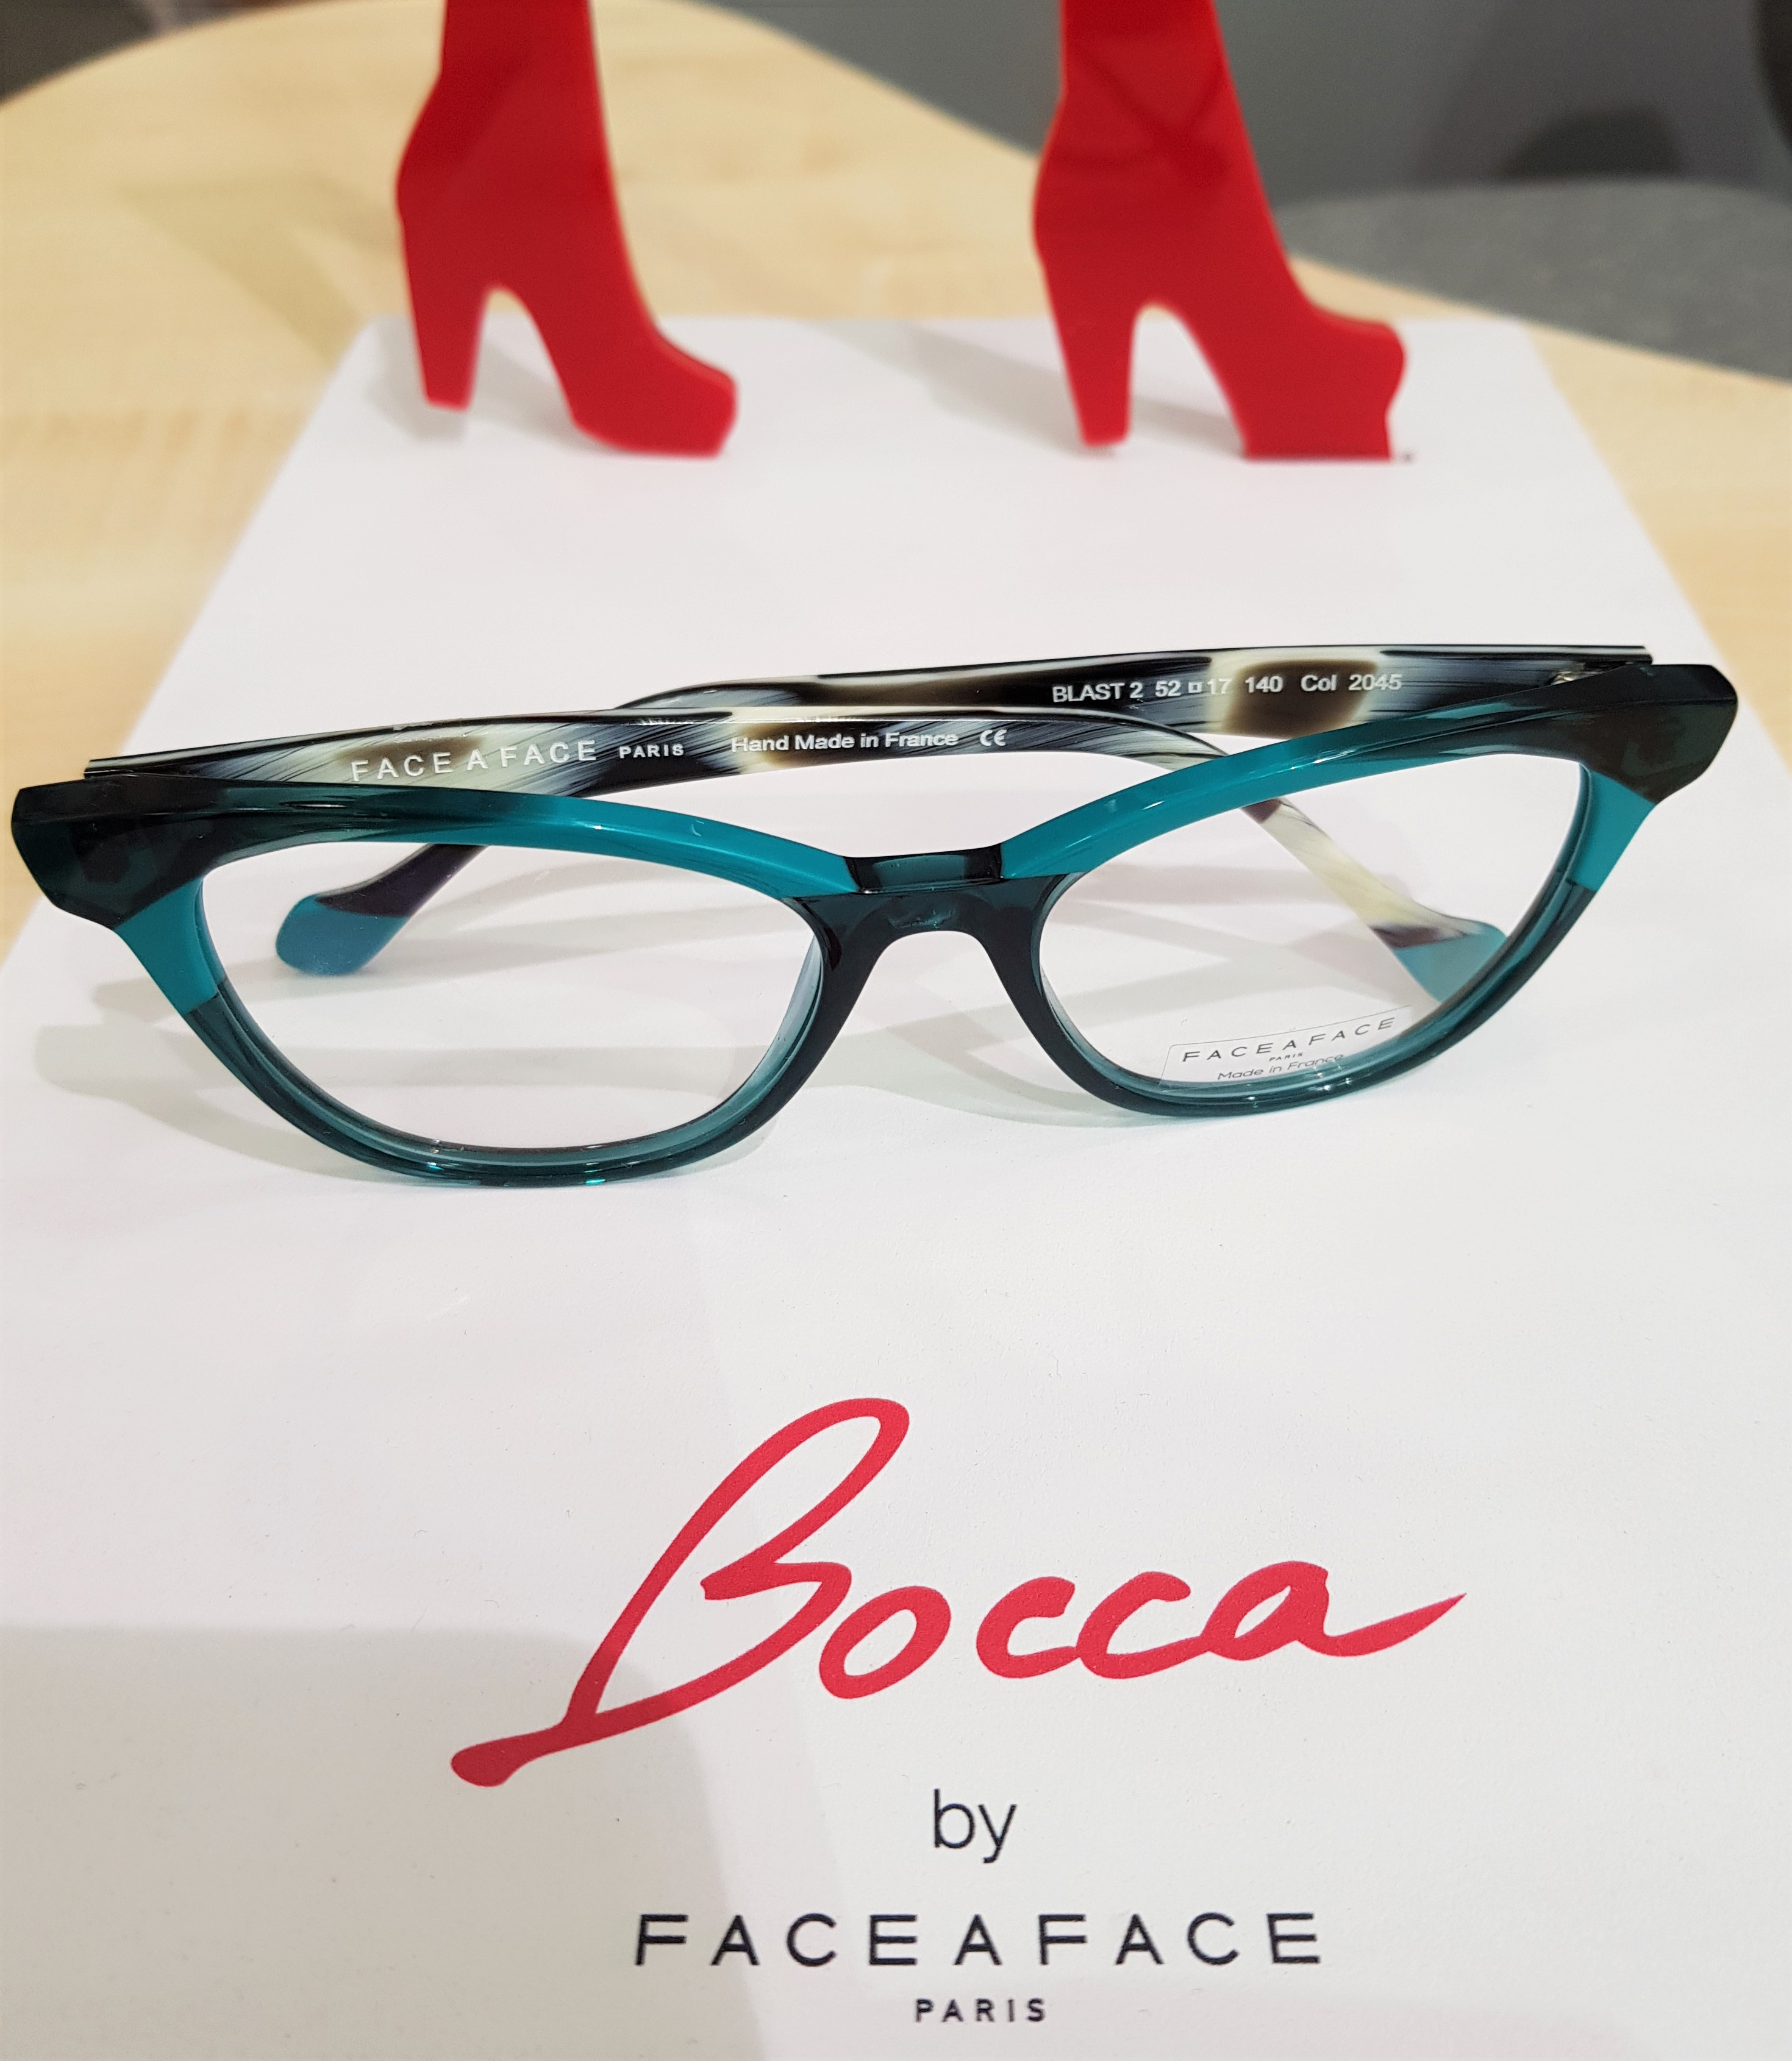 bocca-glasses-2